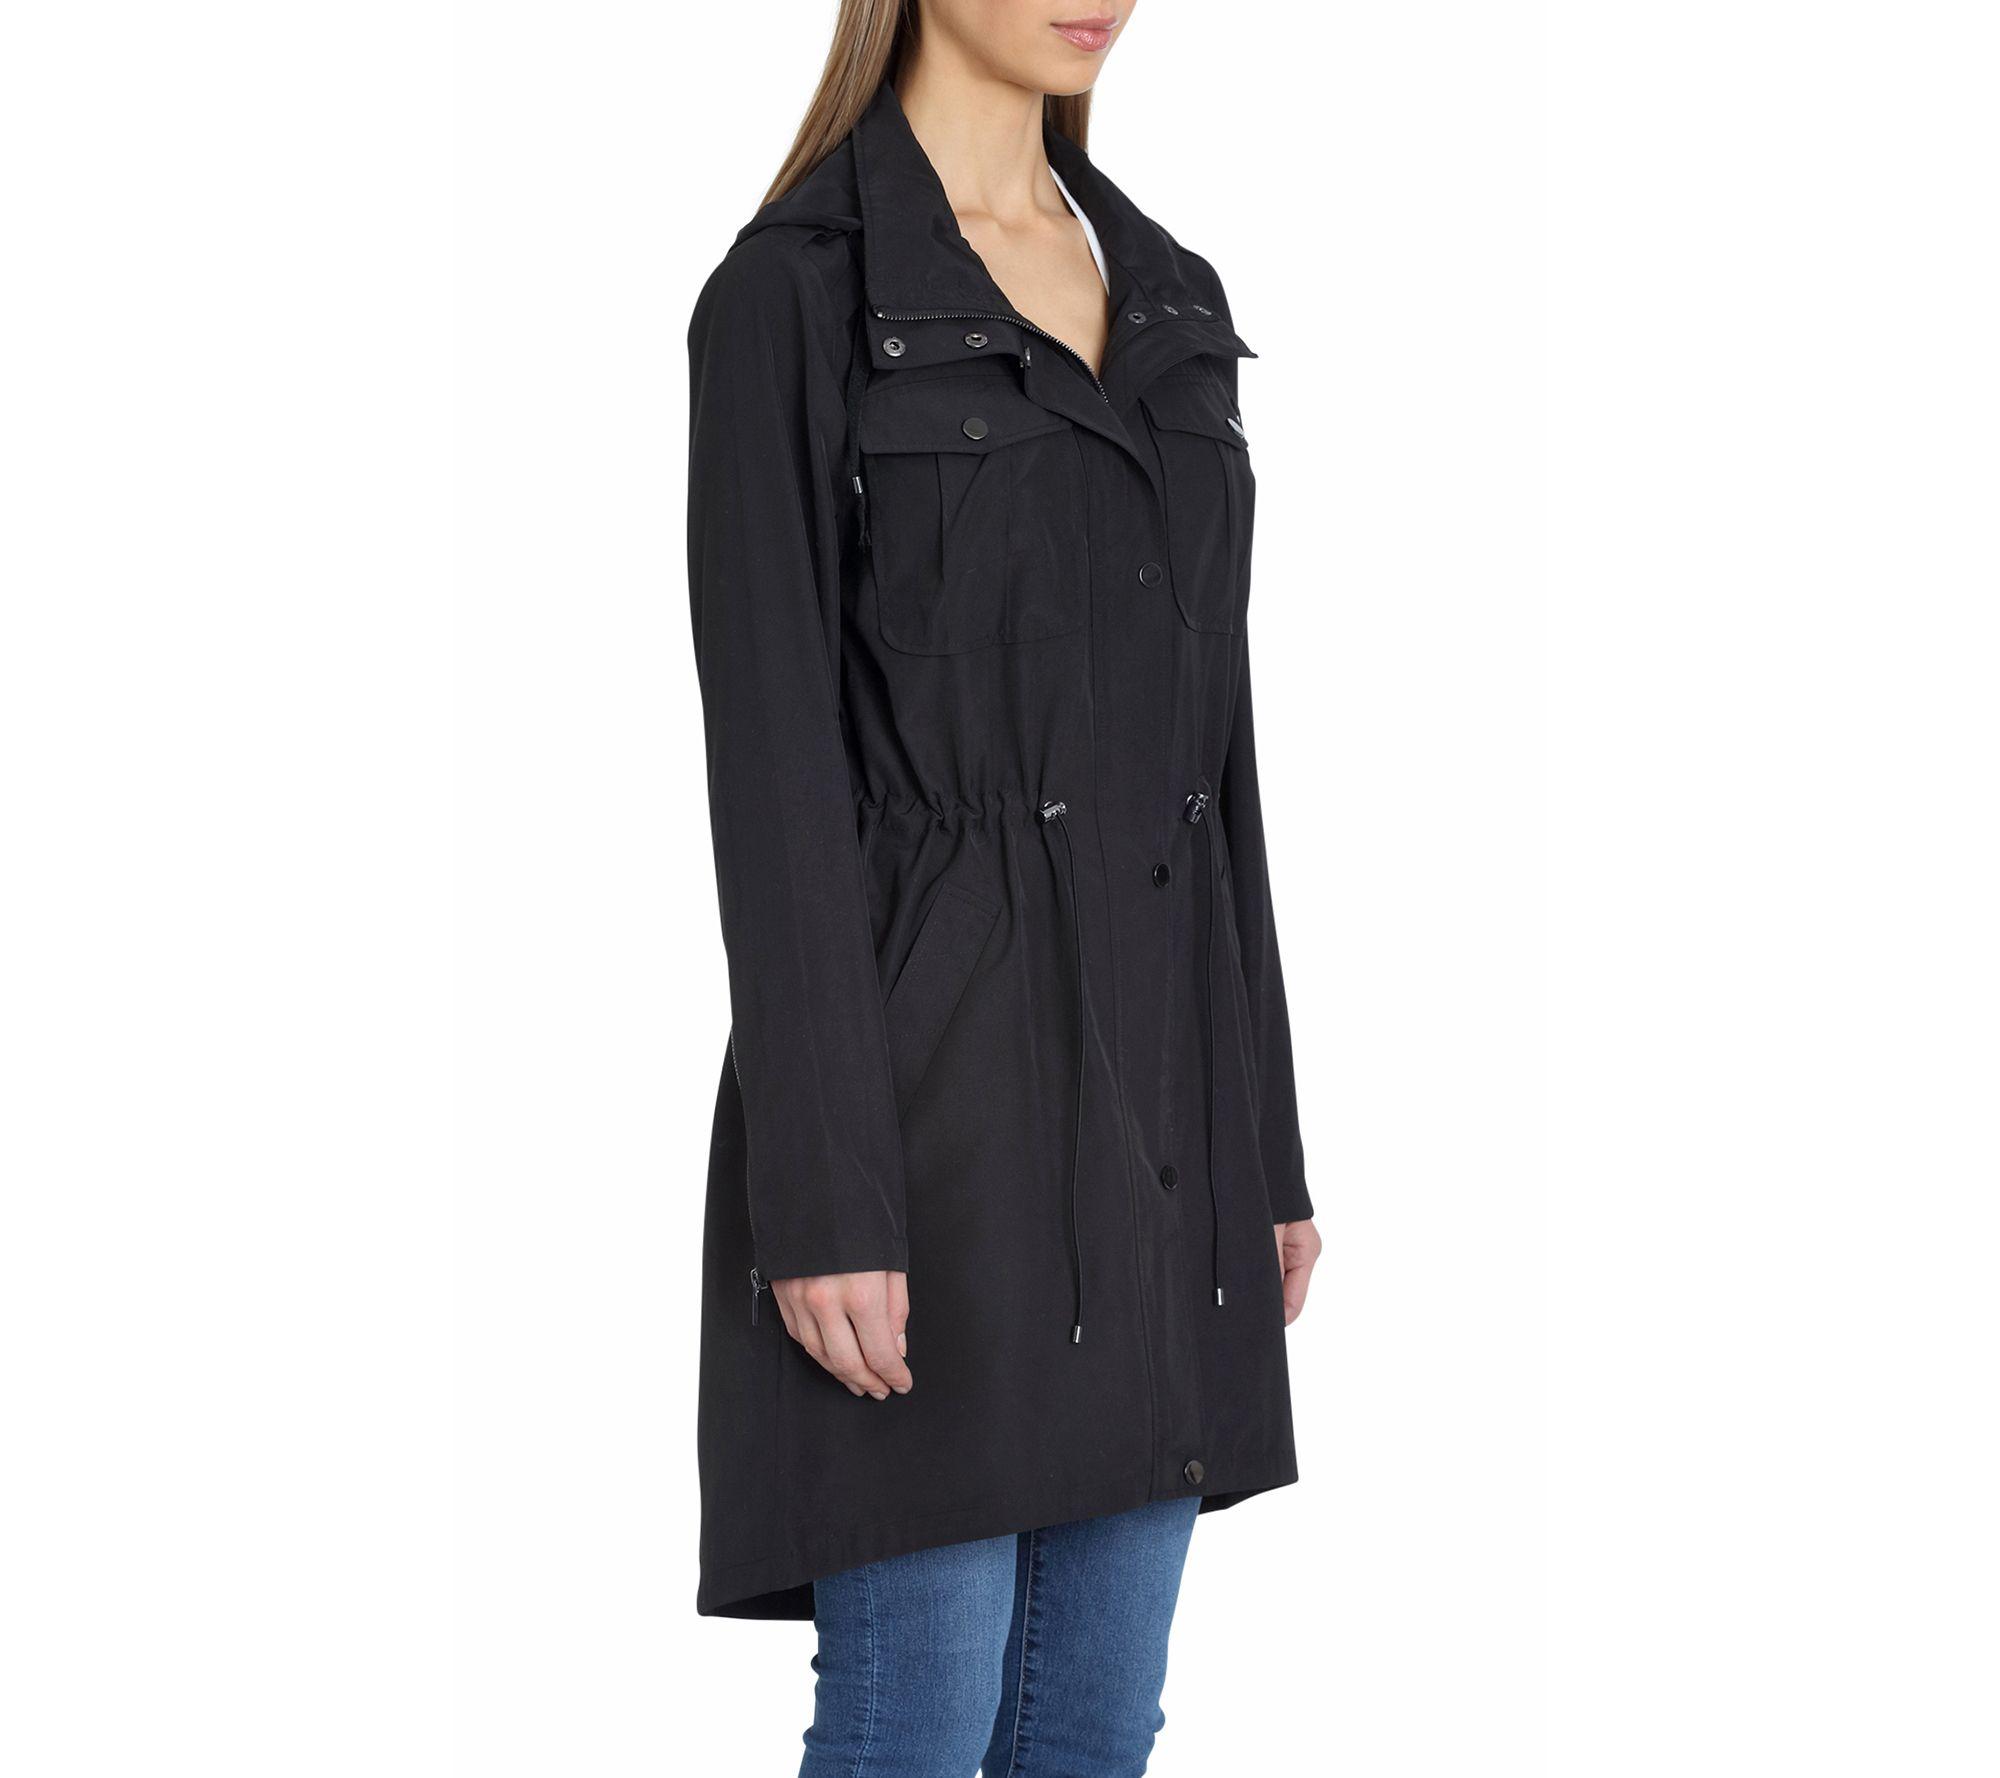 46e612059e9 Badgley Mischka Dakota Water-Resistant Anorak Jacket — QVC.com